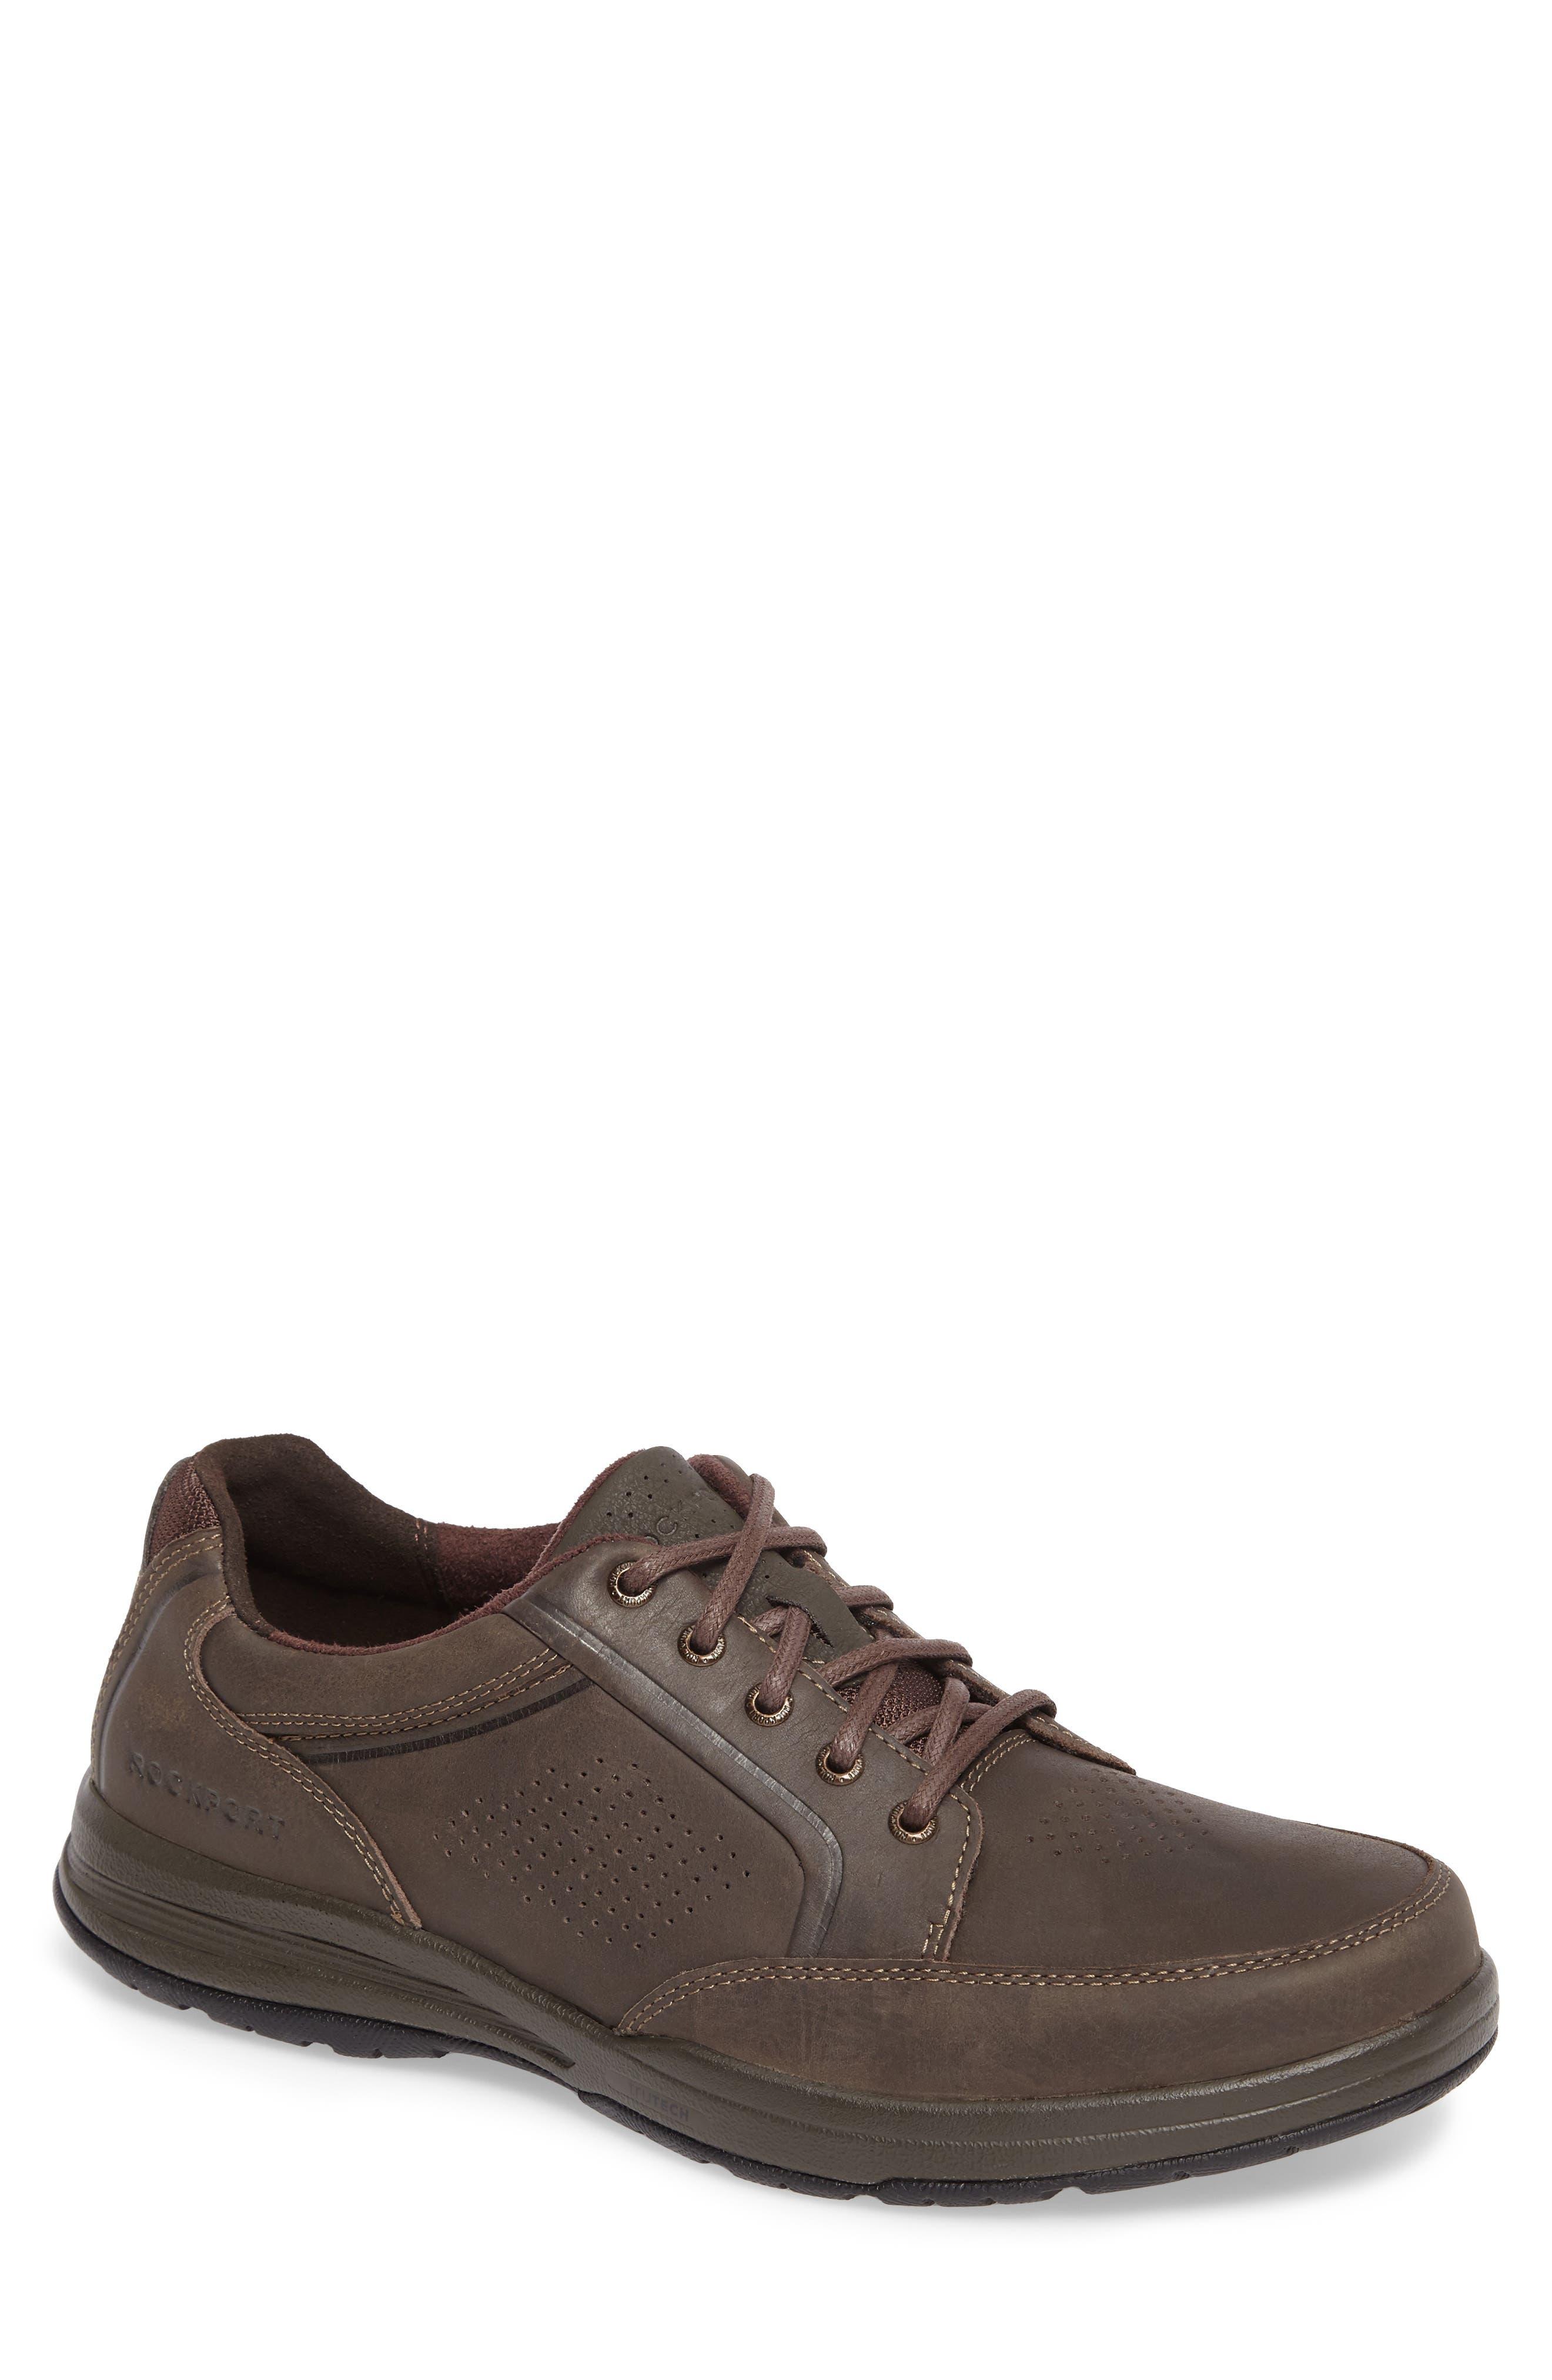 ROCKPORT BearCove Park Mudguard Sneaker